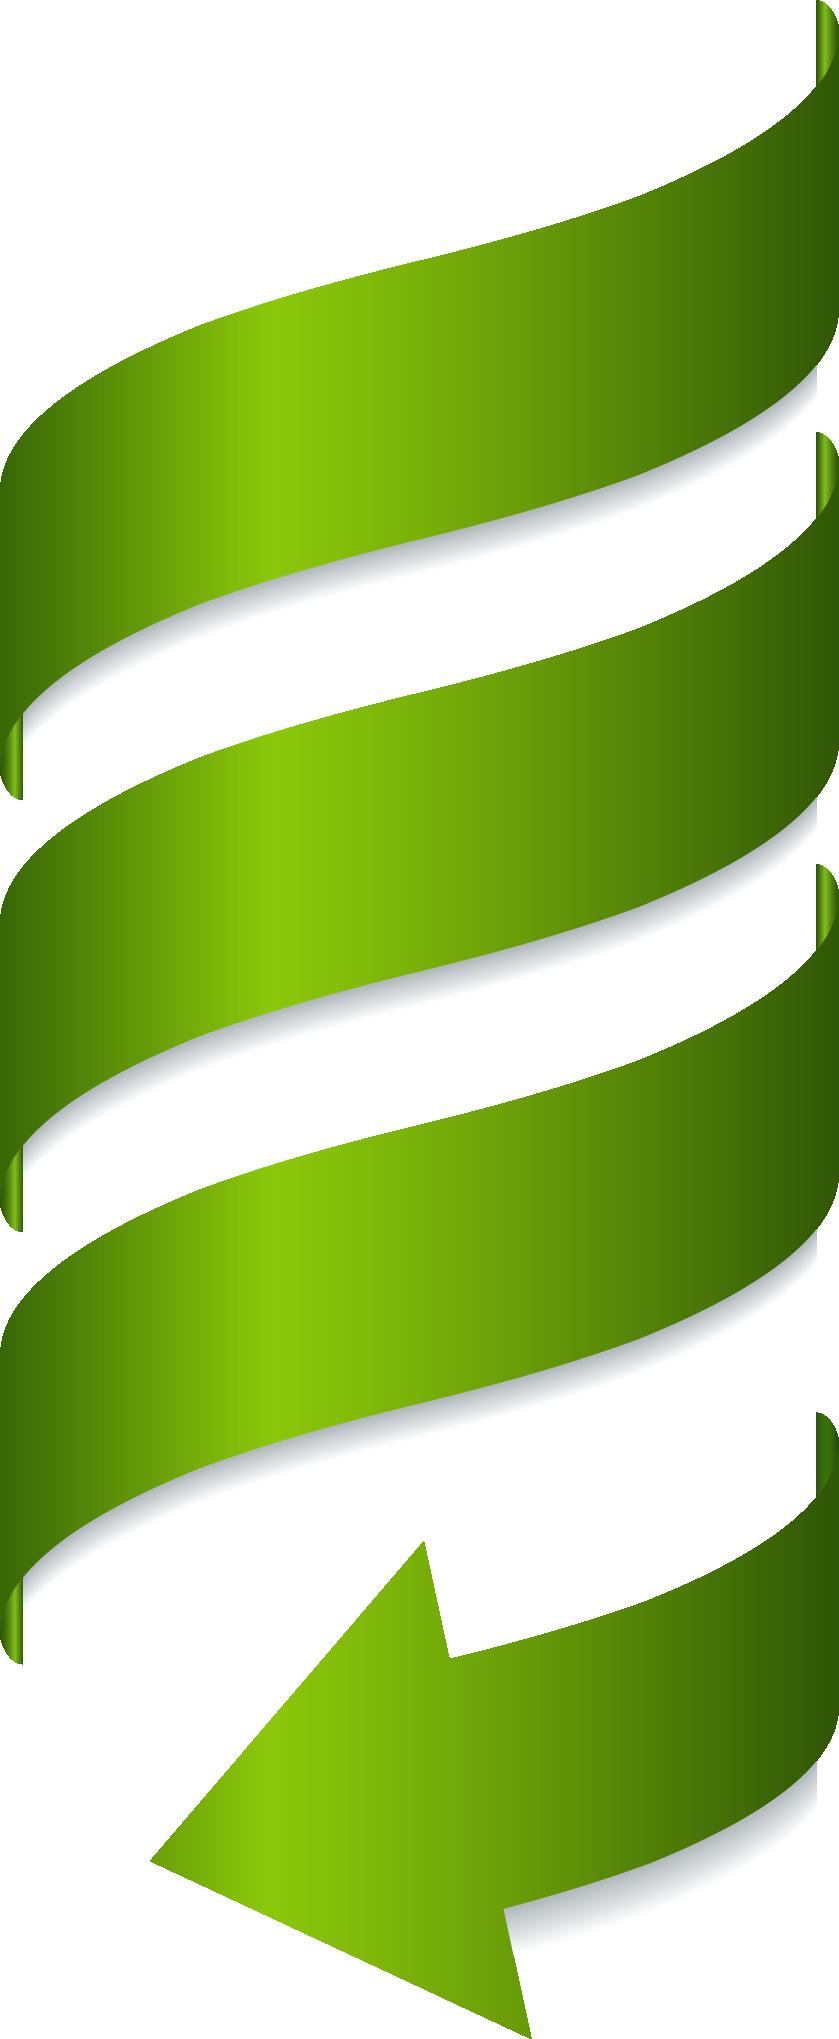 Painted Spiral Euclidean Vector Green Arrow Arrow Image Green Arrow Arrow Clipart